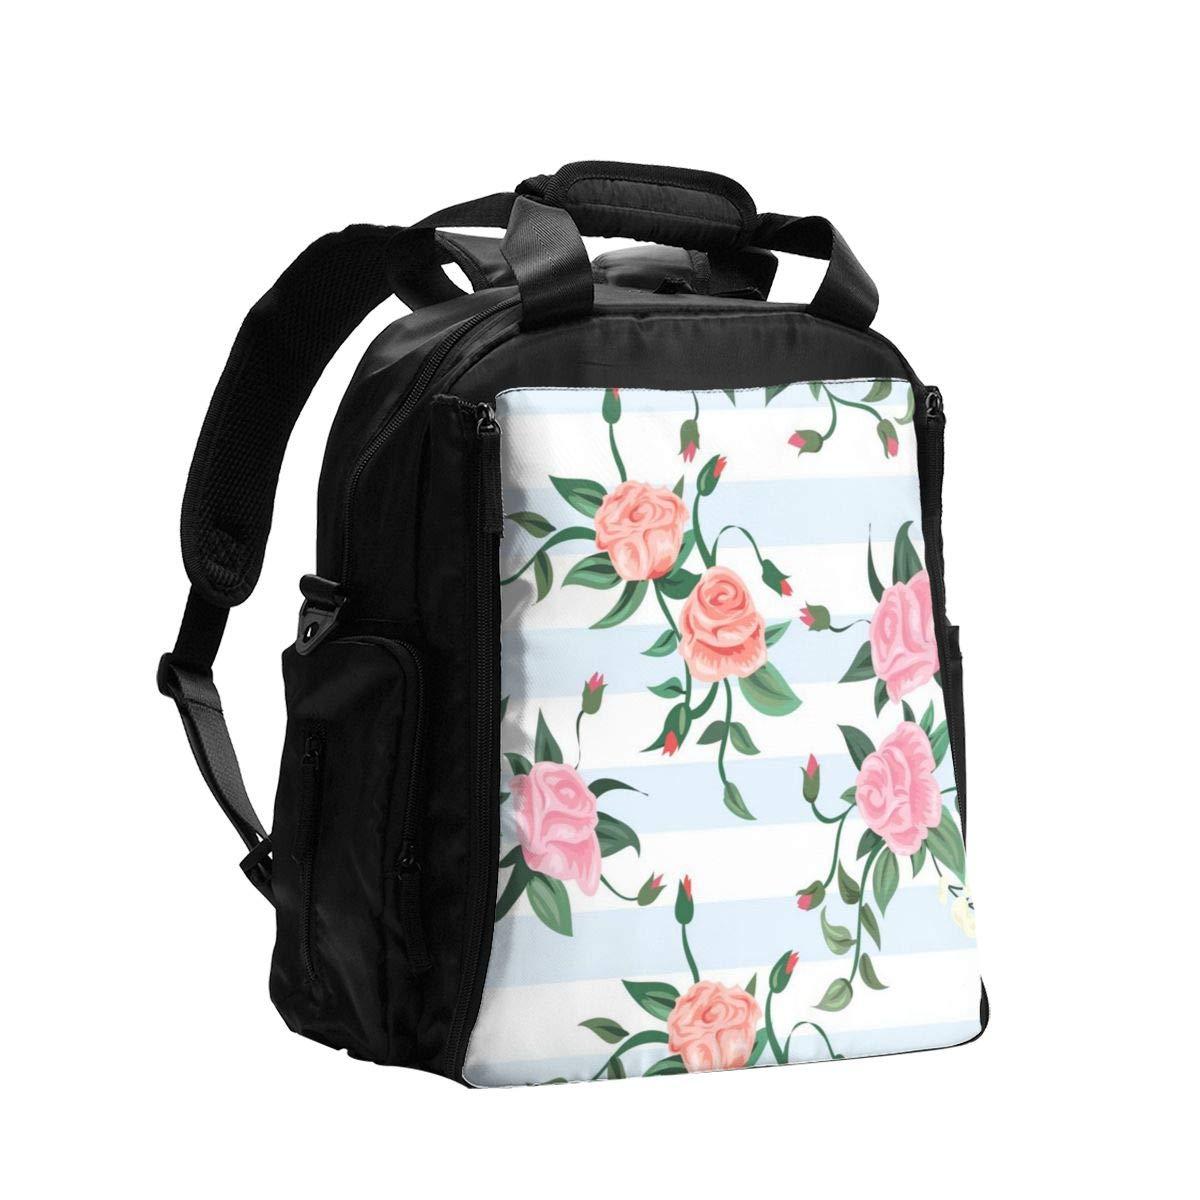 Diaper Bag Backpack Watercolor Blue Leaves Light Pink Flowers Floral Baby Diaper Bag Tote Travel Waterproof Mom Mommy